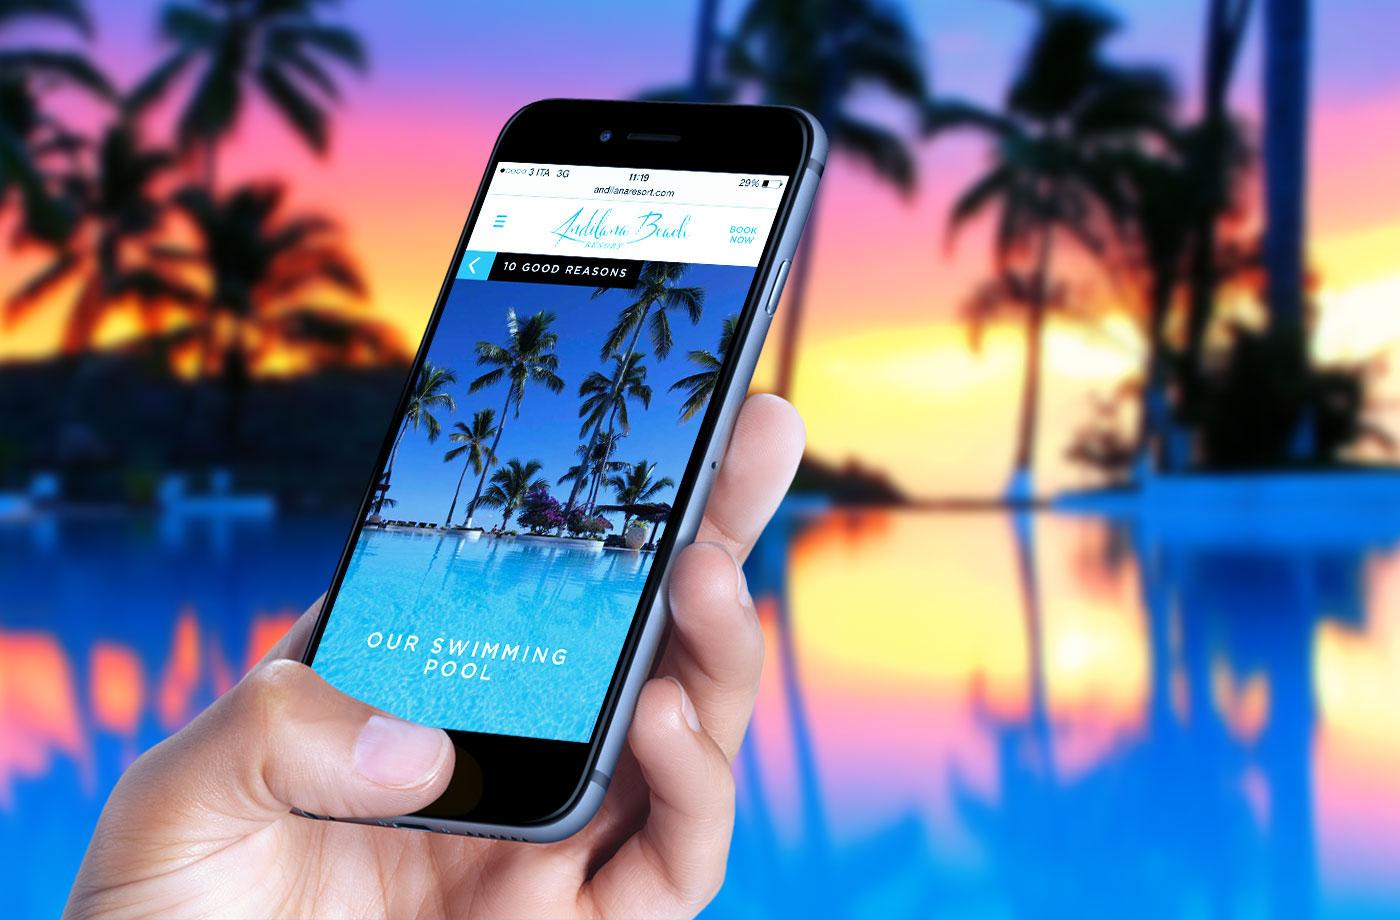 andilana madagascar resort nosybe tour lemur hotel Holiday mobile app iphone